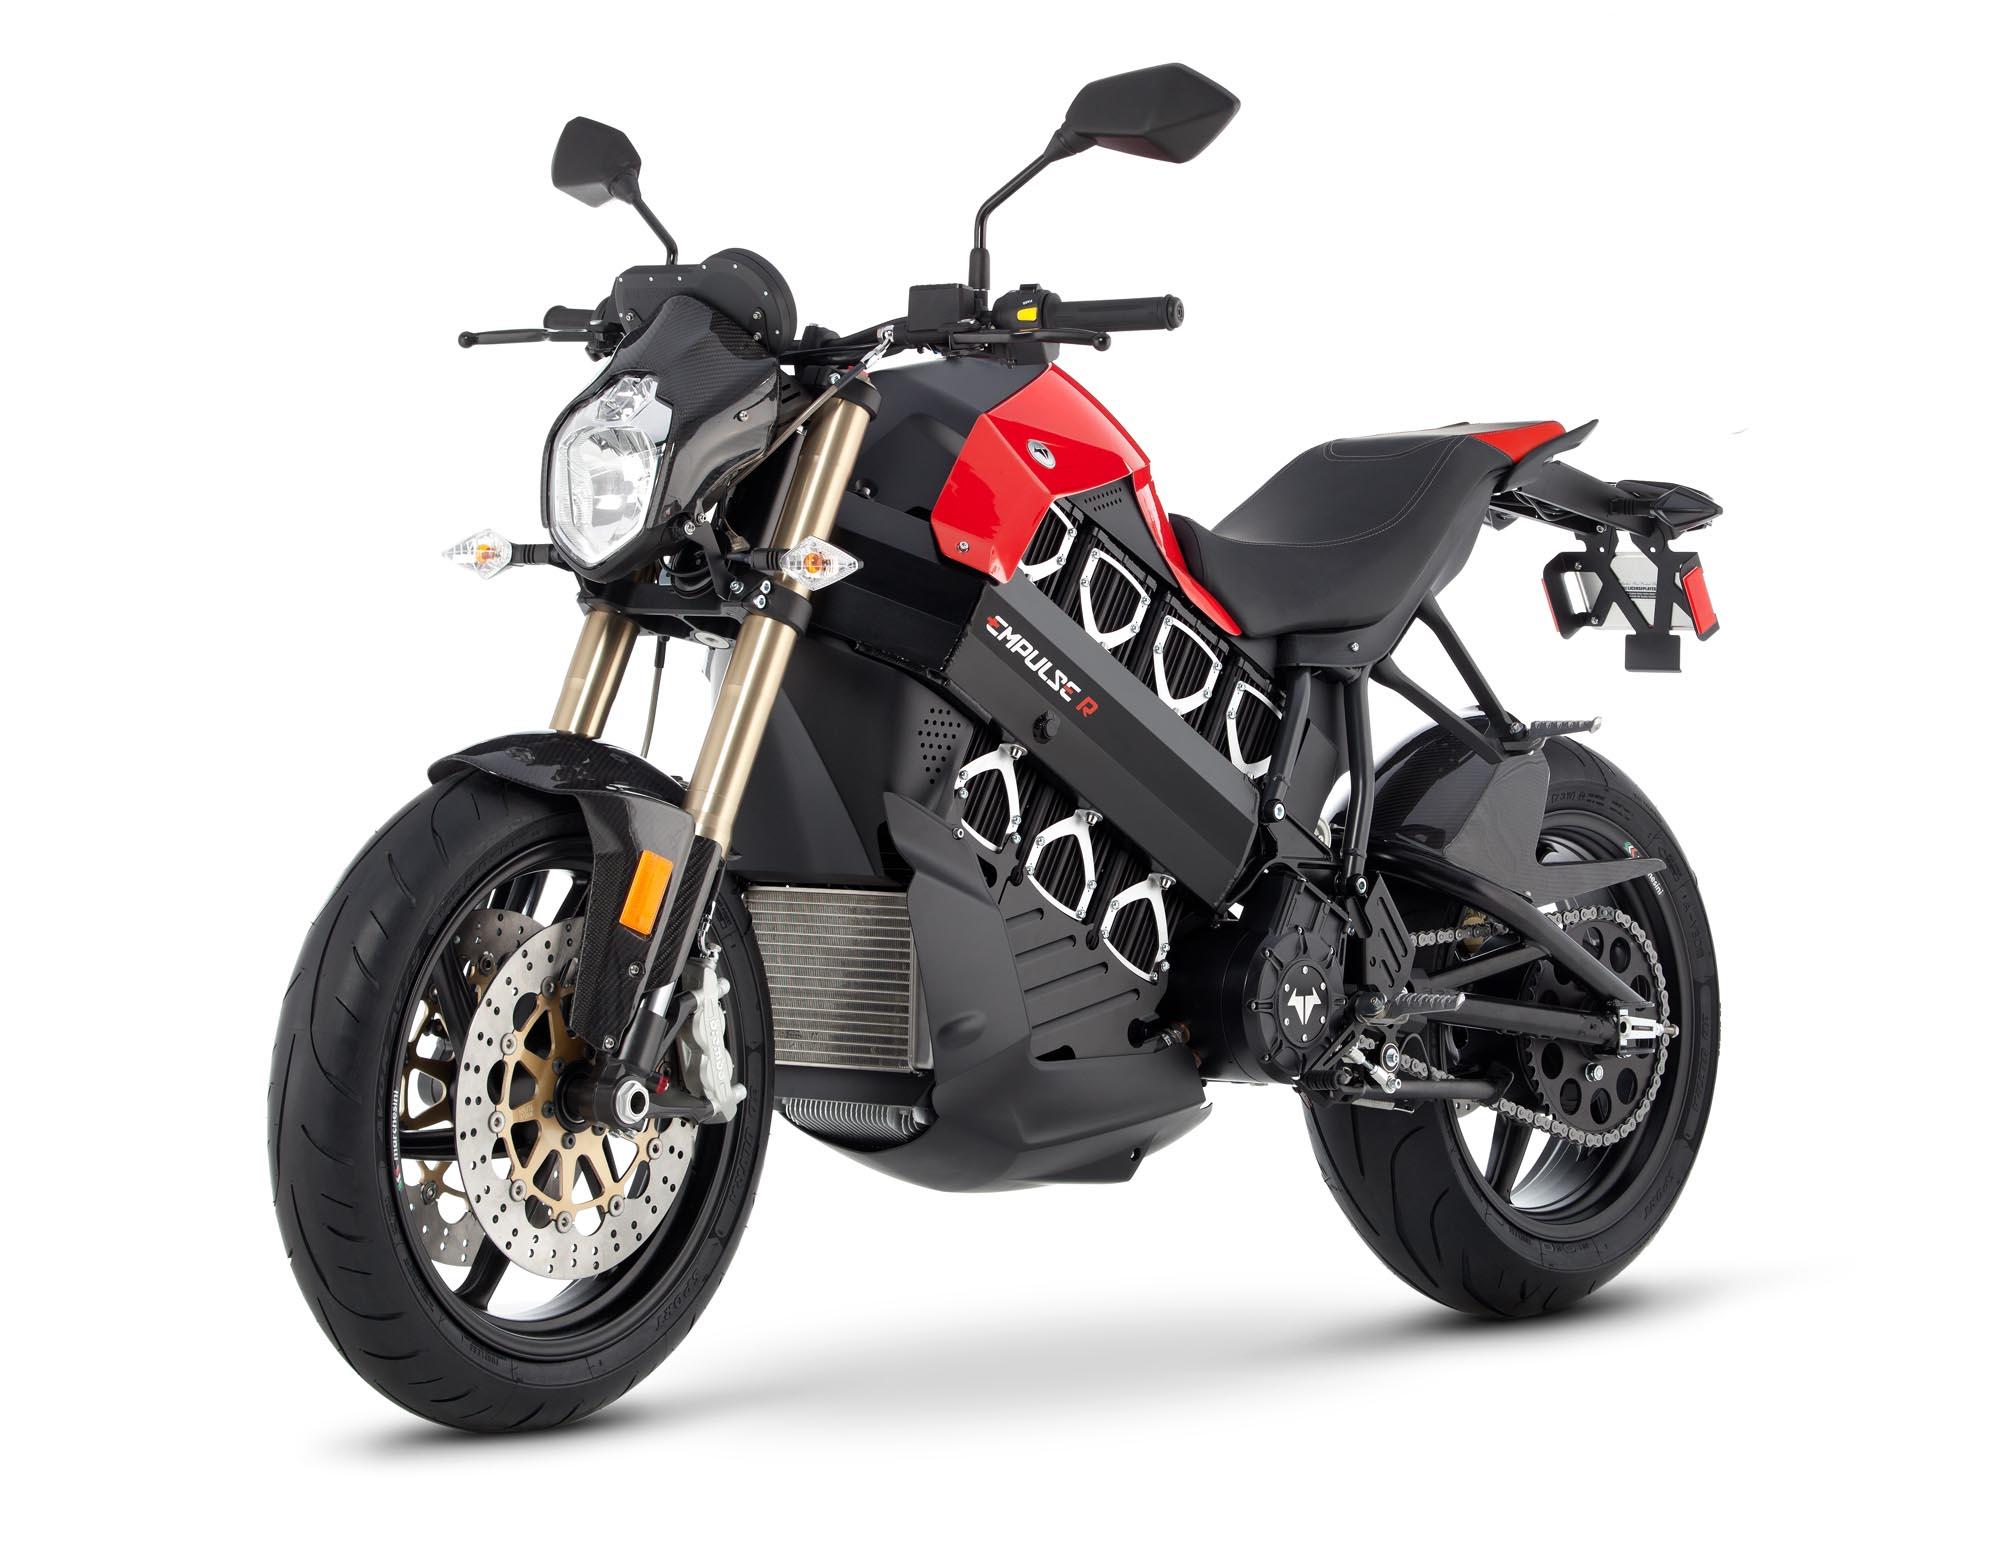 Polaris buys electric motorcycle firm Brammo